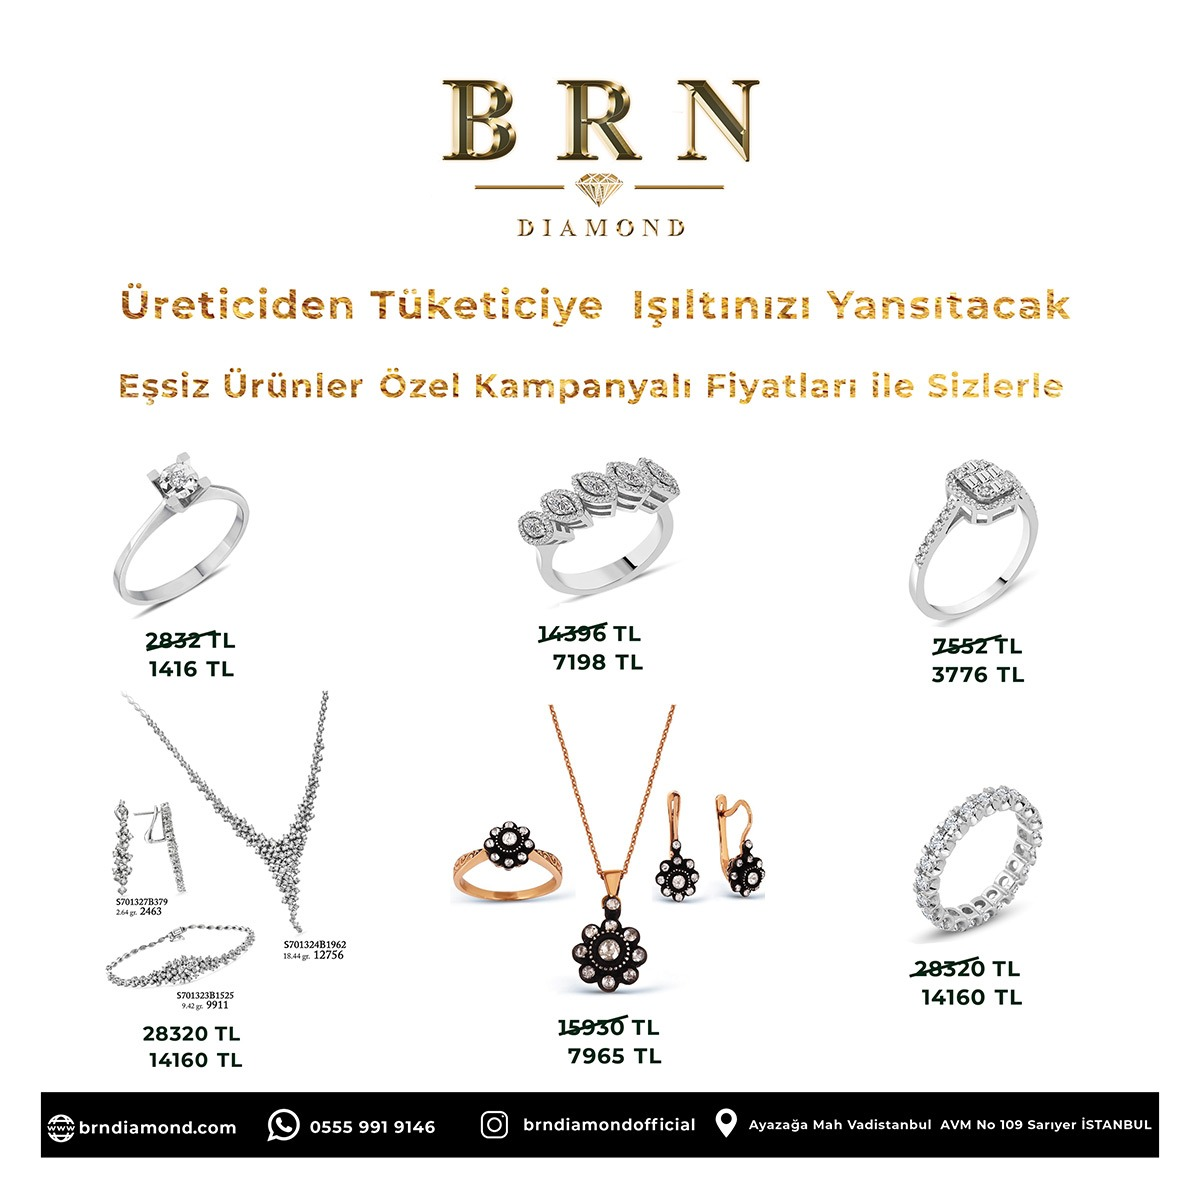 brn diamond broşür